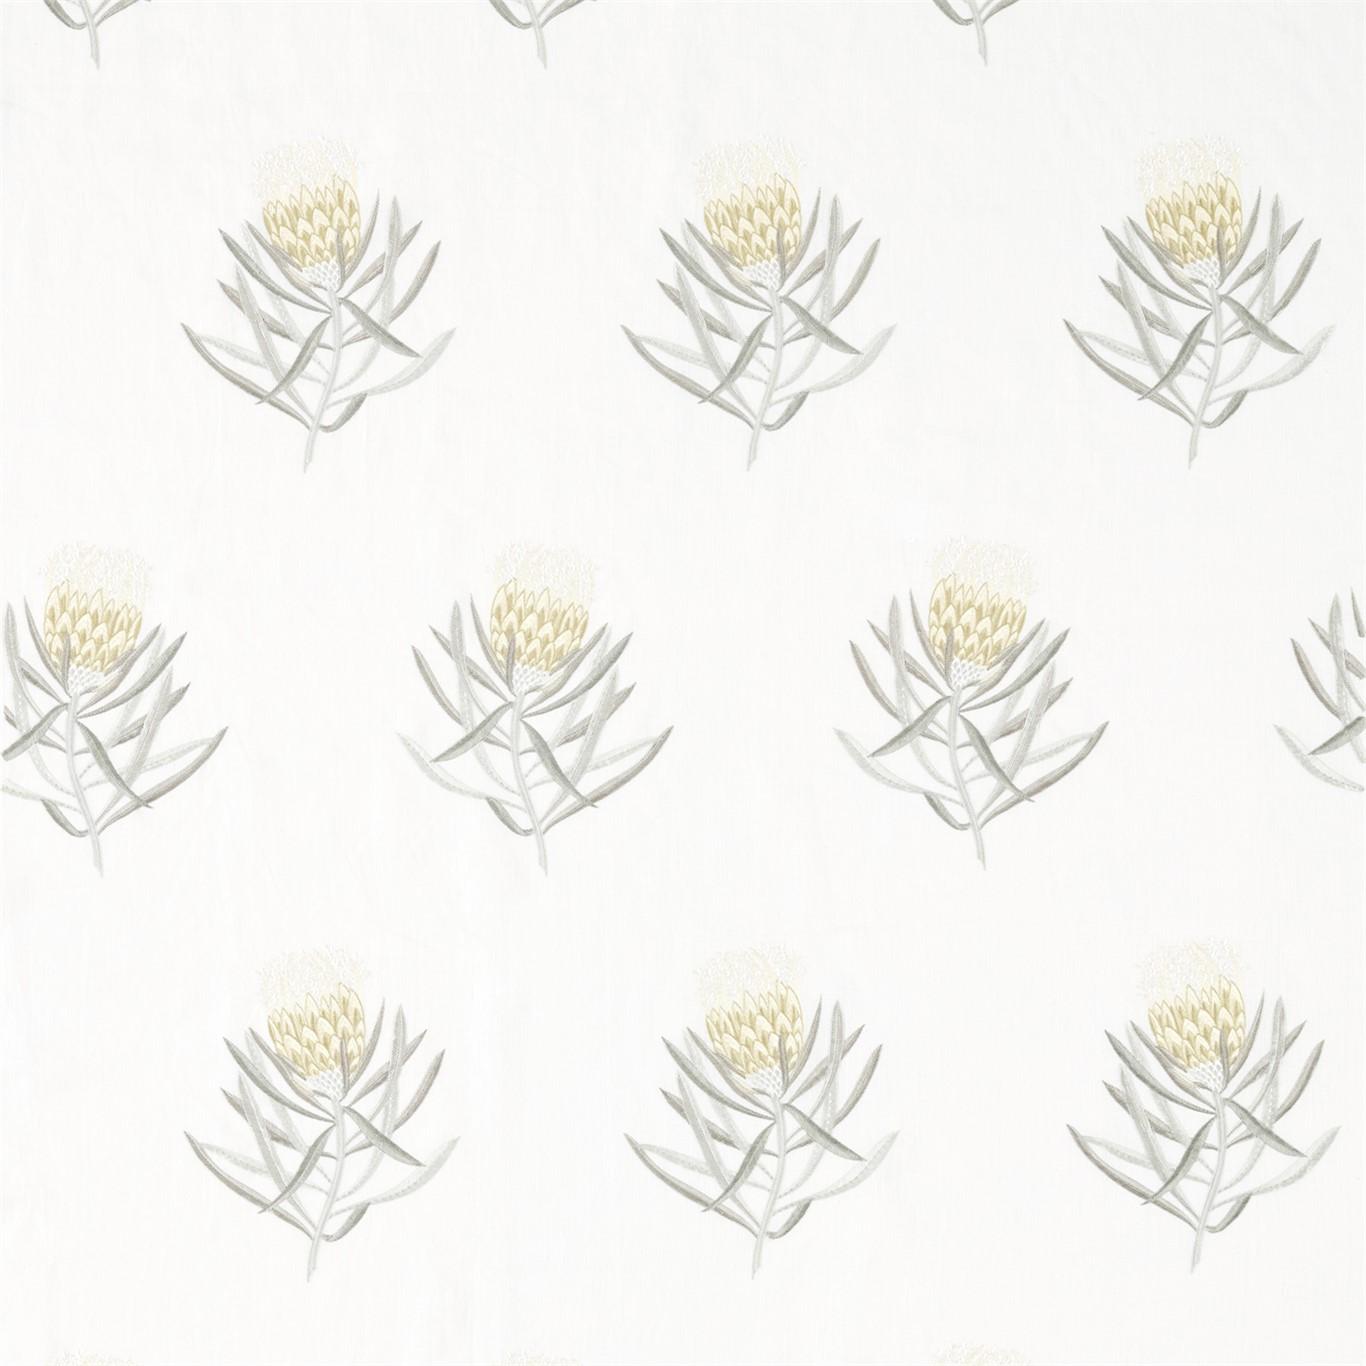 PROTEA FLOWER DAFFODIL